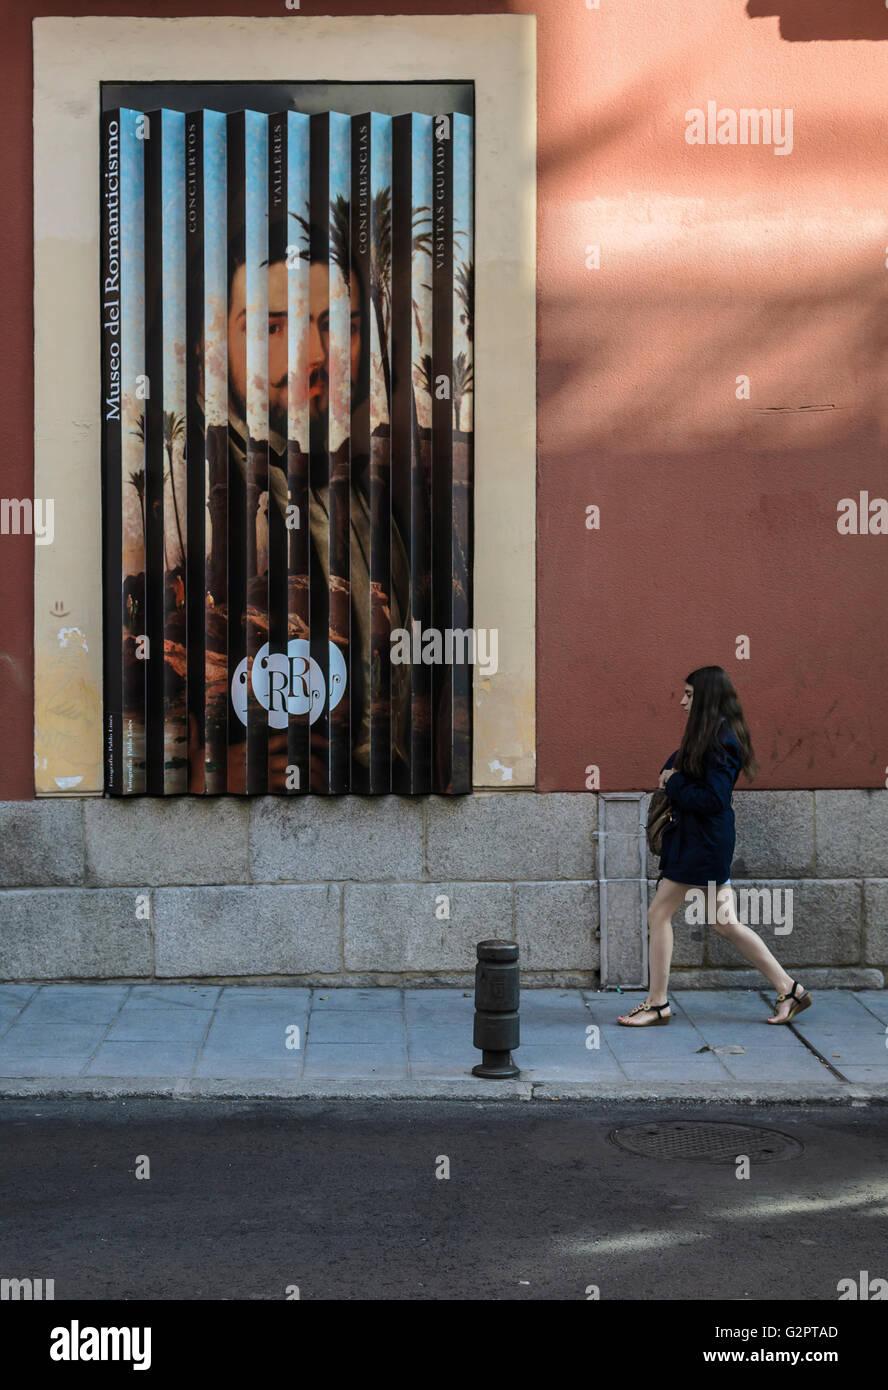 Madrid, Spanien, 2. Juni 2016.  Freien Blick auf das Romantik-Museum in Madrid, Spanien. Enrique Davó/Alamy Stockbild